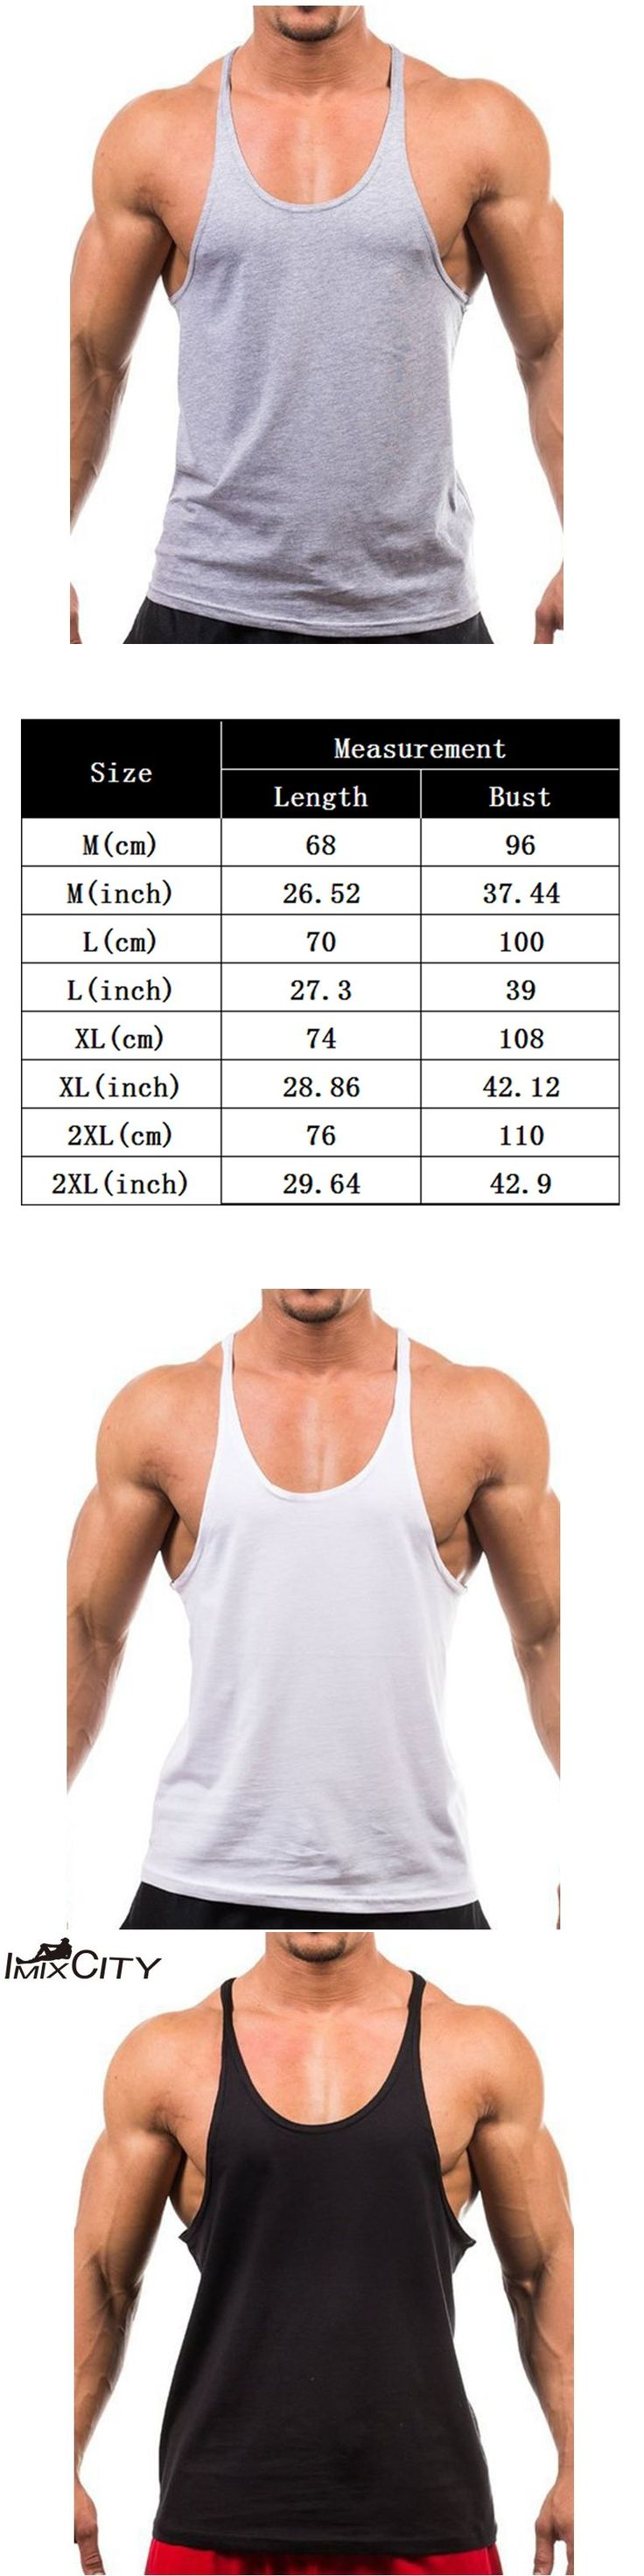 IMIXCITY Men's Vest Basic Solid Bodybuilding Tank Tops Workout Fitness male Cotton Loose T shirt  2017 Fashion